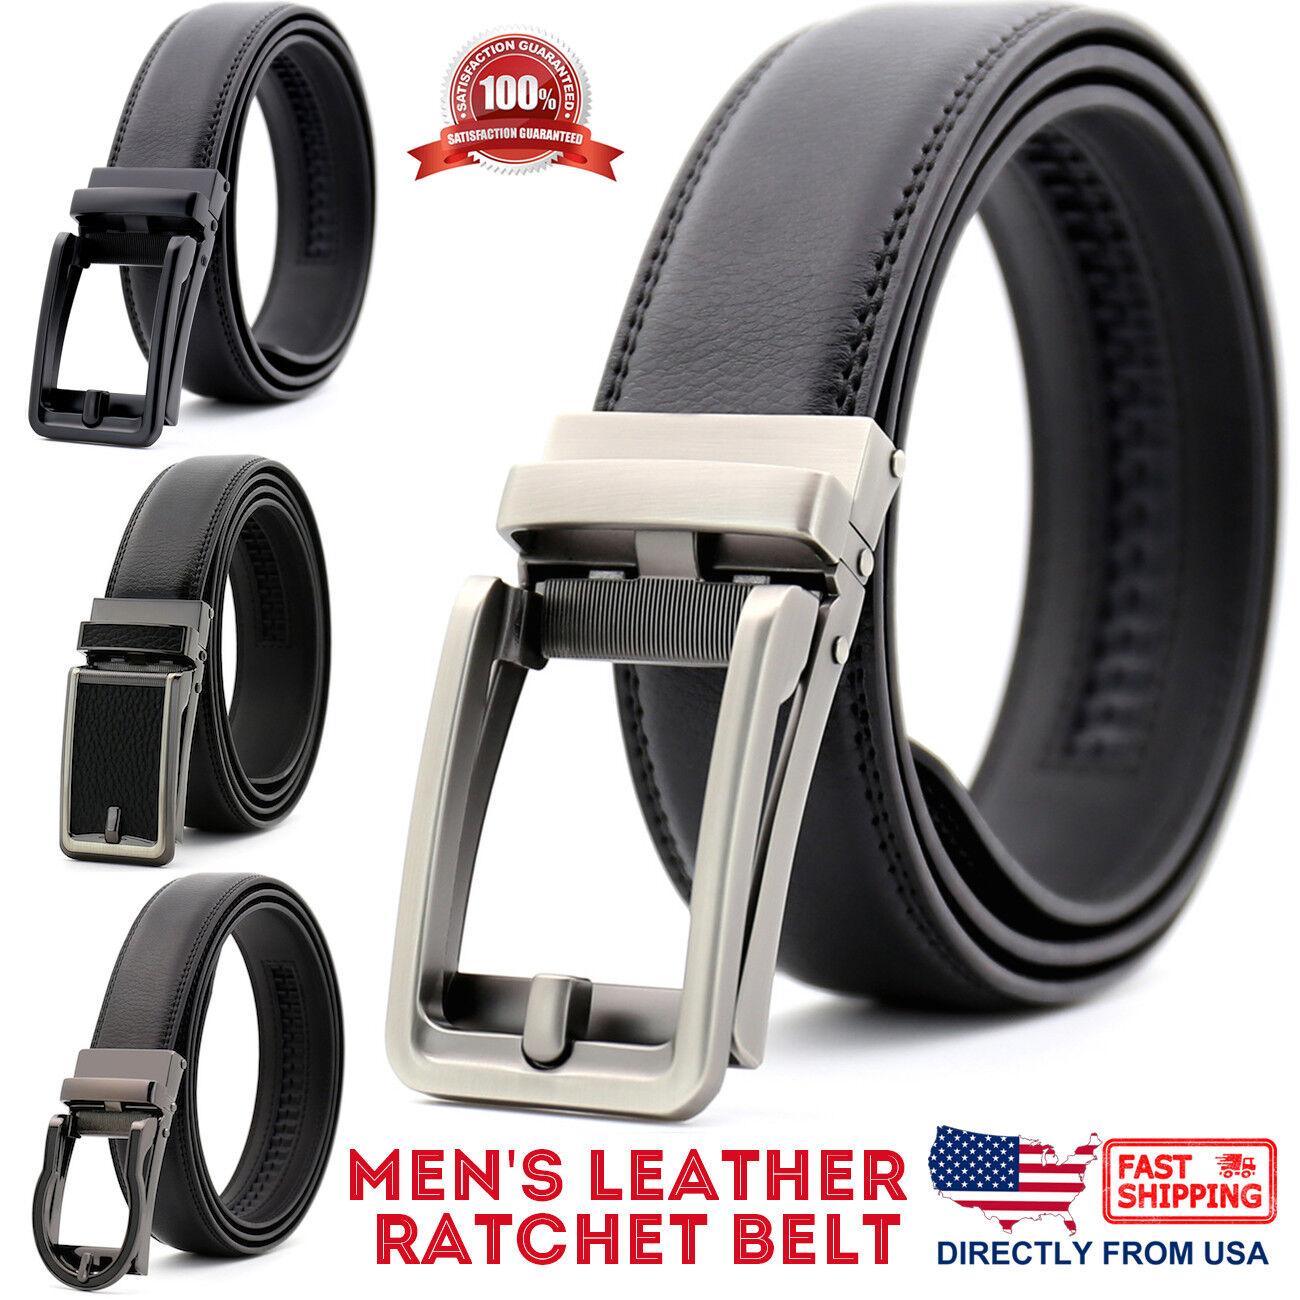 Men's Genuine Leather Adjustable Automatic Buckle Ratchet Golf Dress Belt Belts